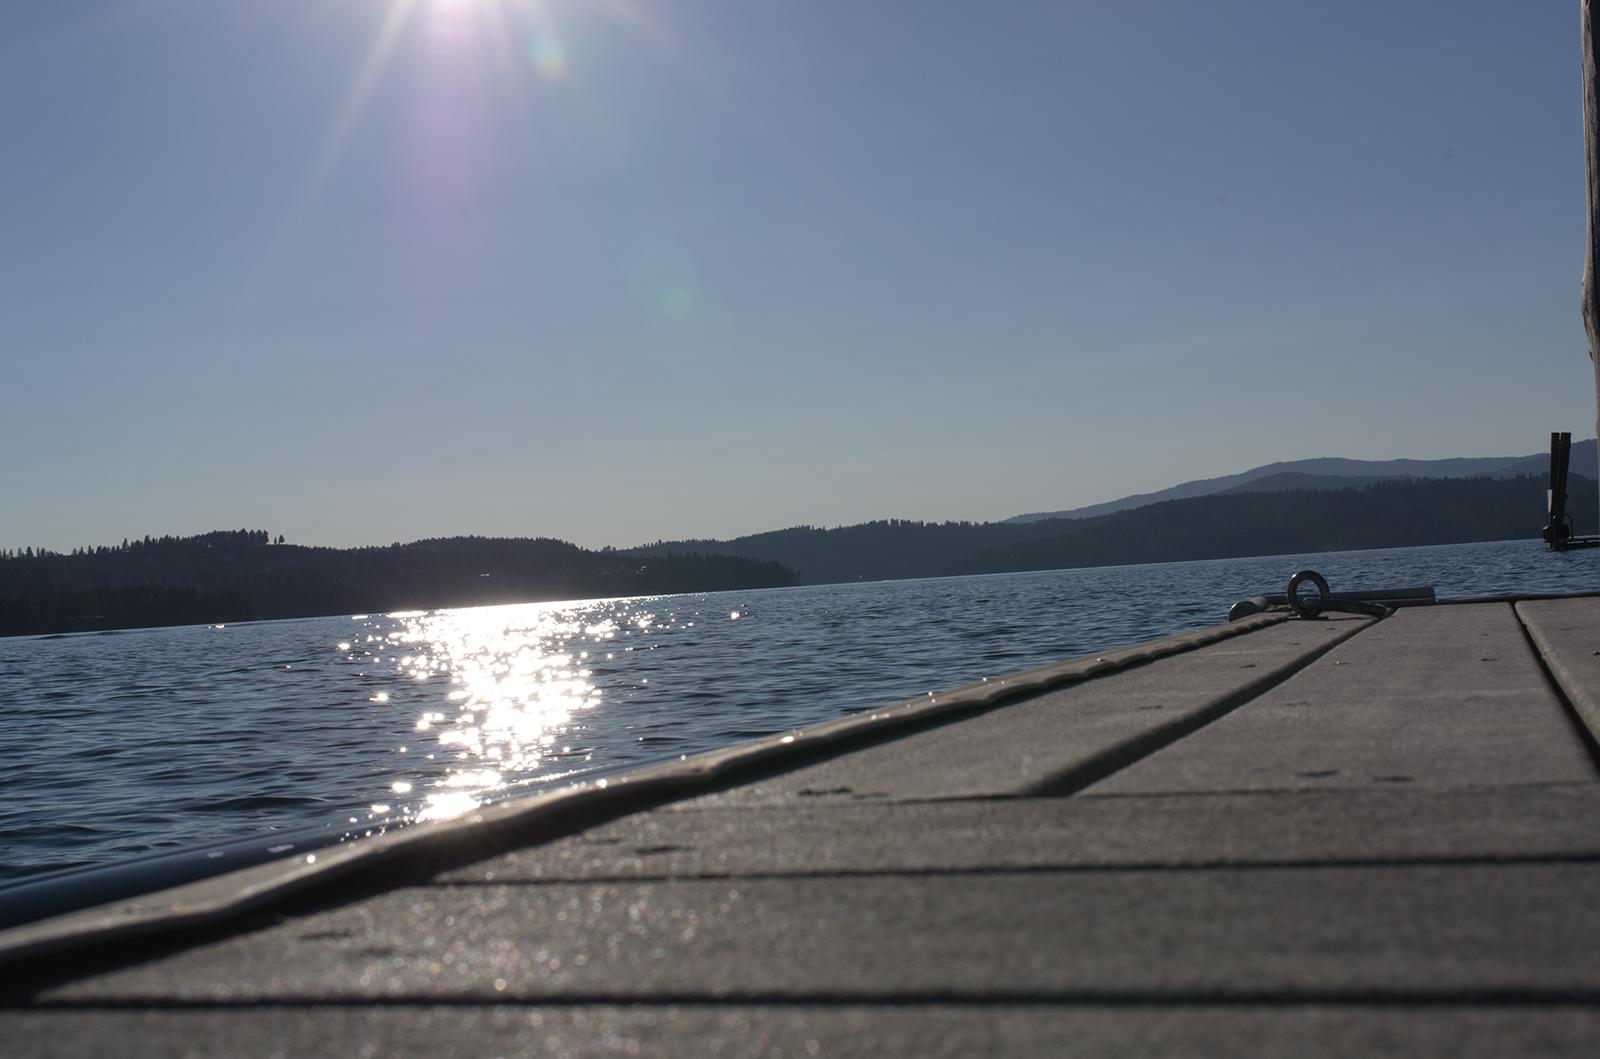 Lake Coeur d'Alene Blog